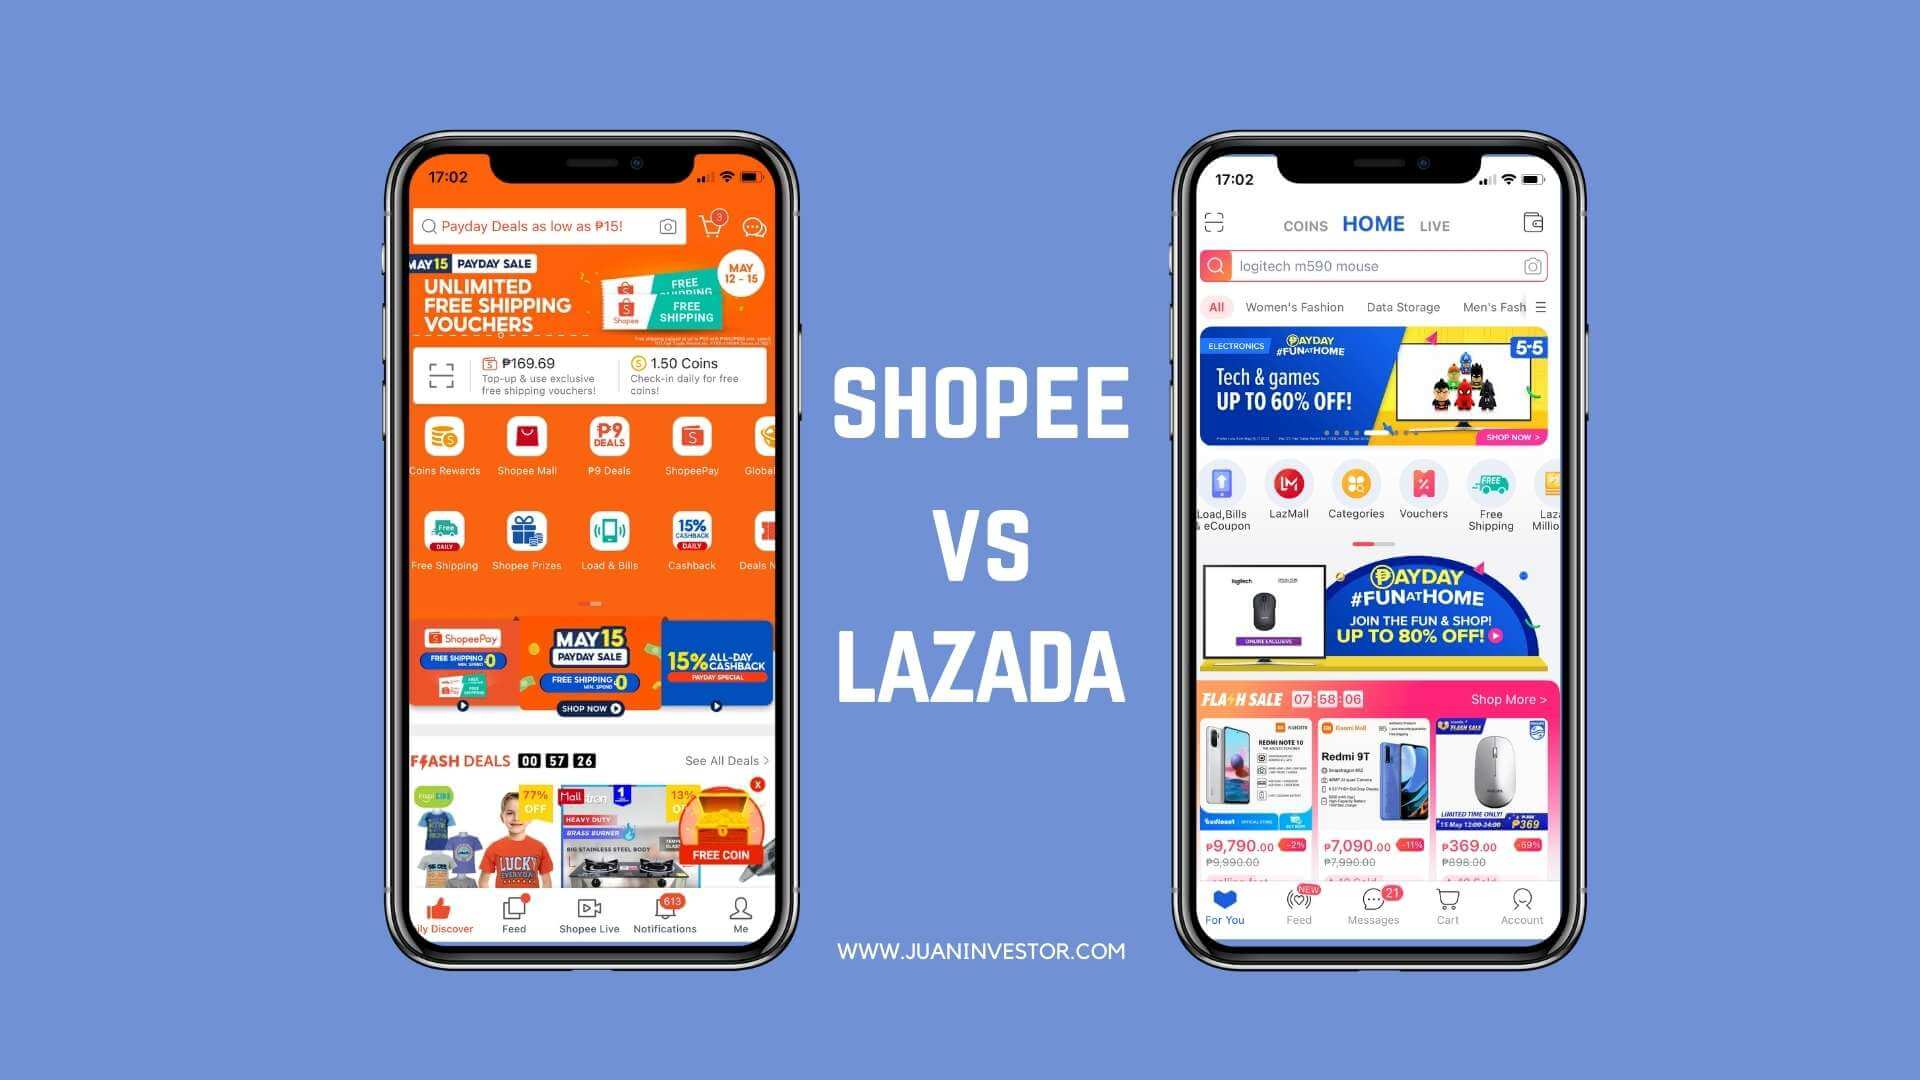 shopee-vs-lazada-user-interface